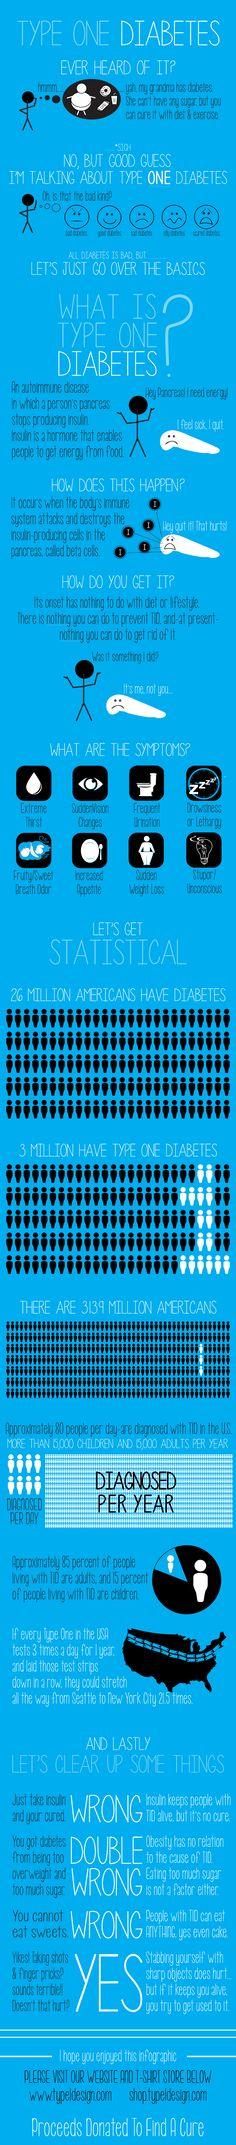 Type 1 Diabetes Infographic. #T1D #type_one #diabetes #infographic #free #printable #resource